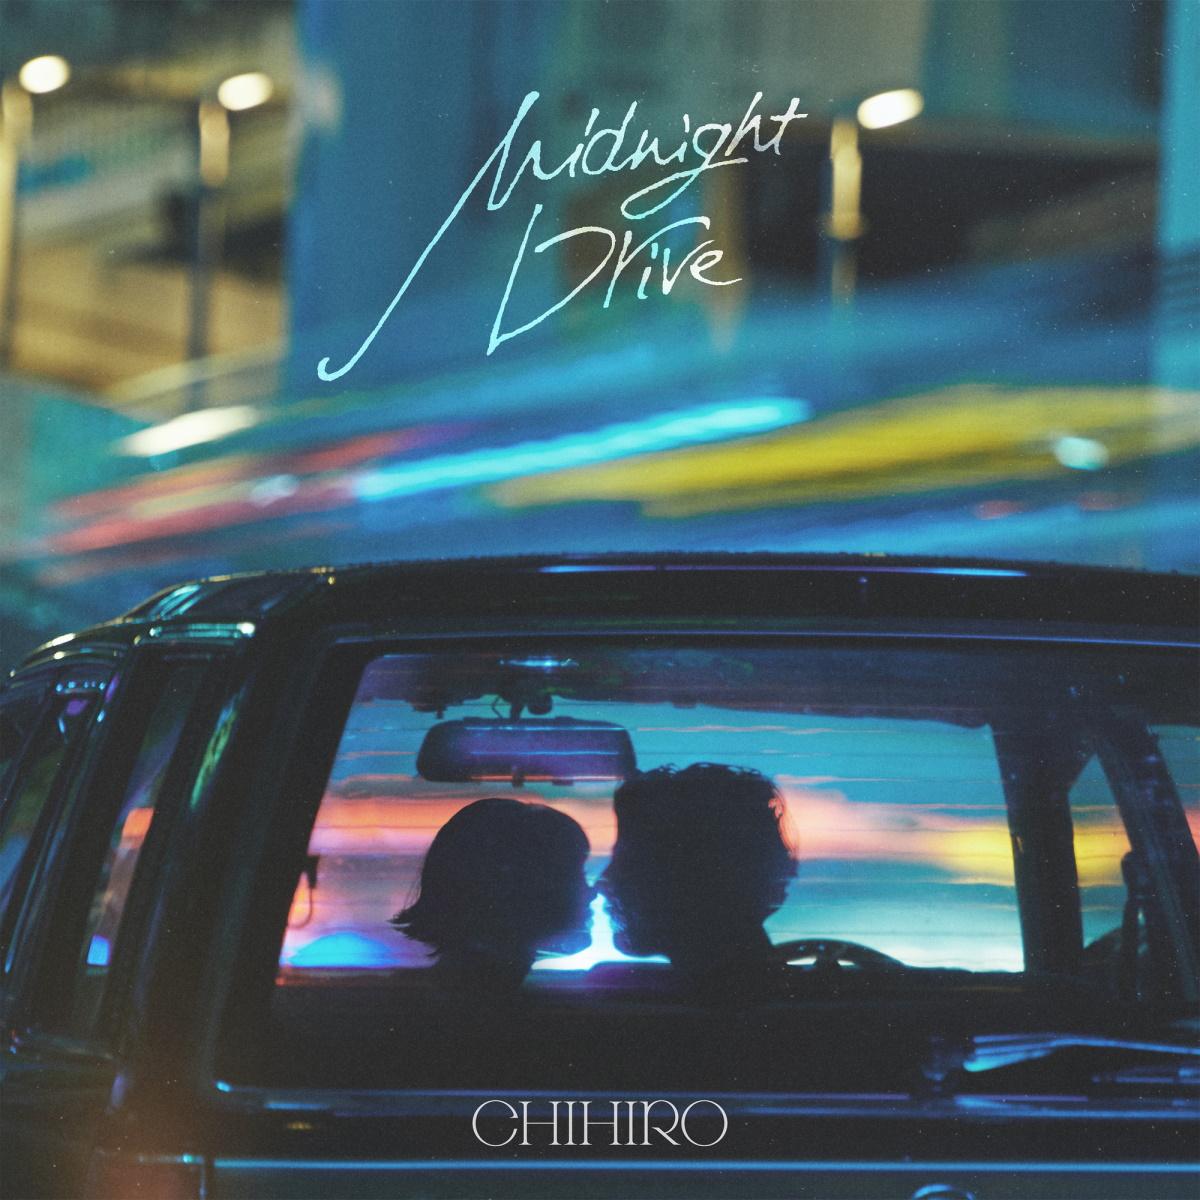 『CHIHIRO - Midnight Drive』収録の『Midnight Drive』ジャケット